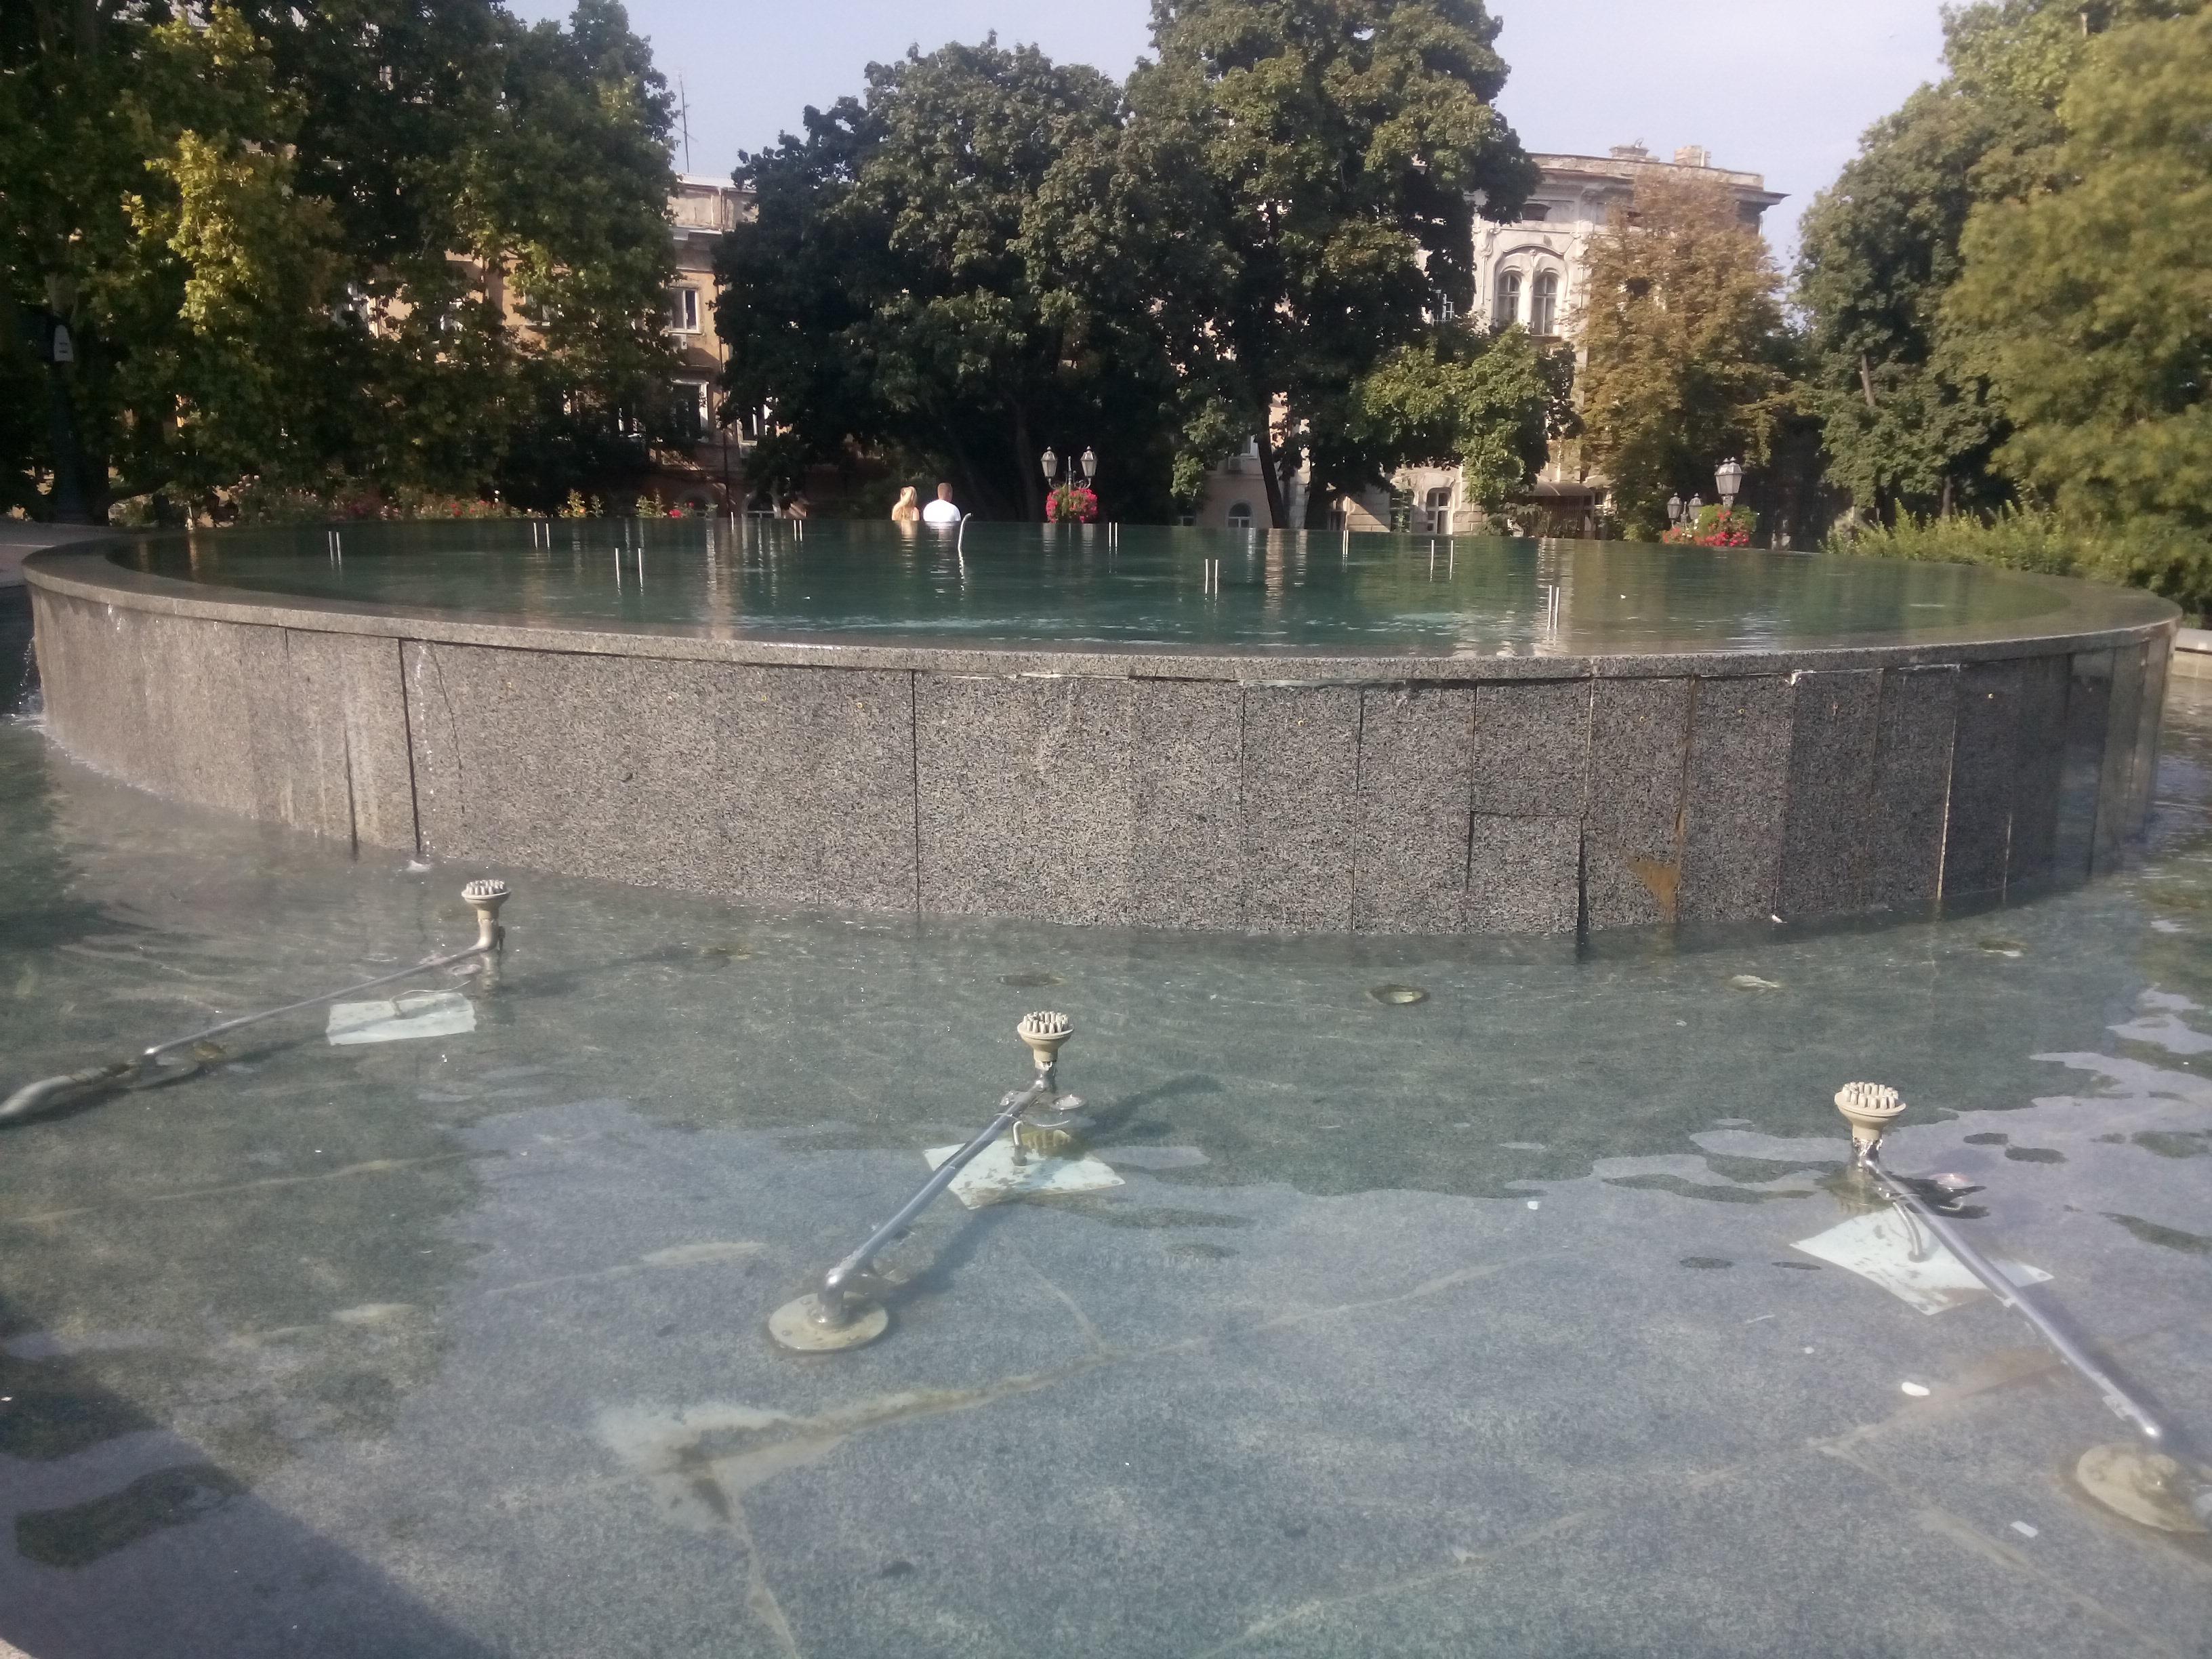 https://i.amy.gy/201808-ukraine/IMG_20180731_170238.jpg